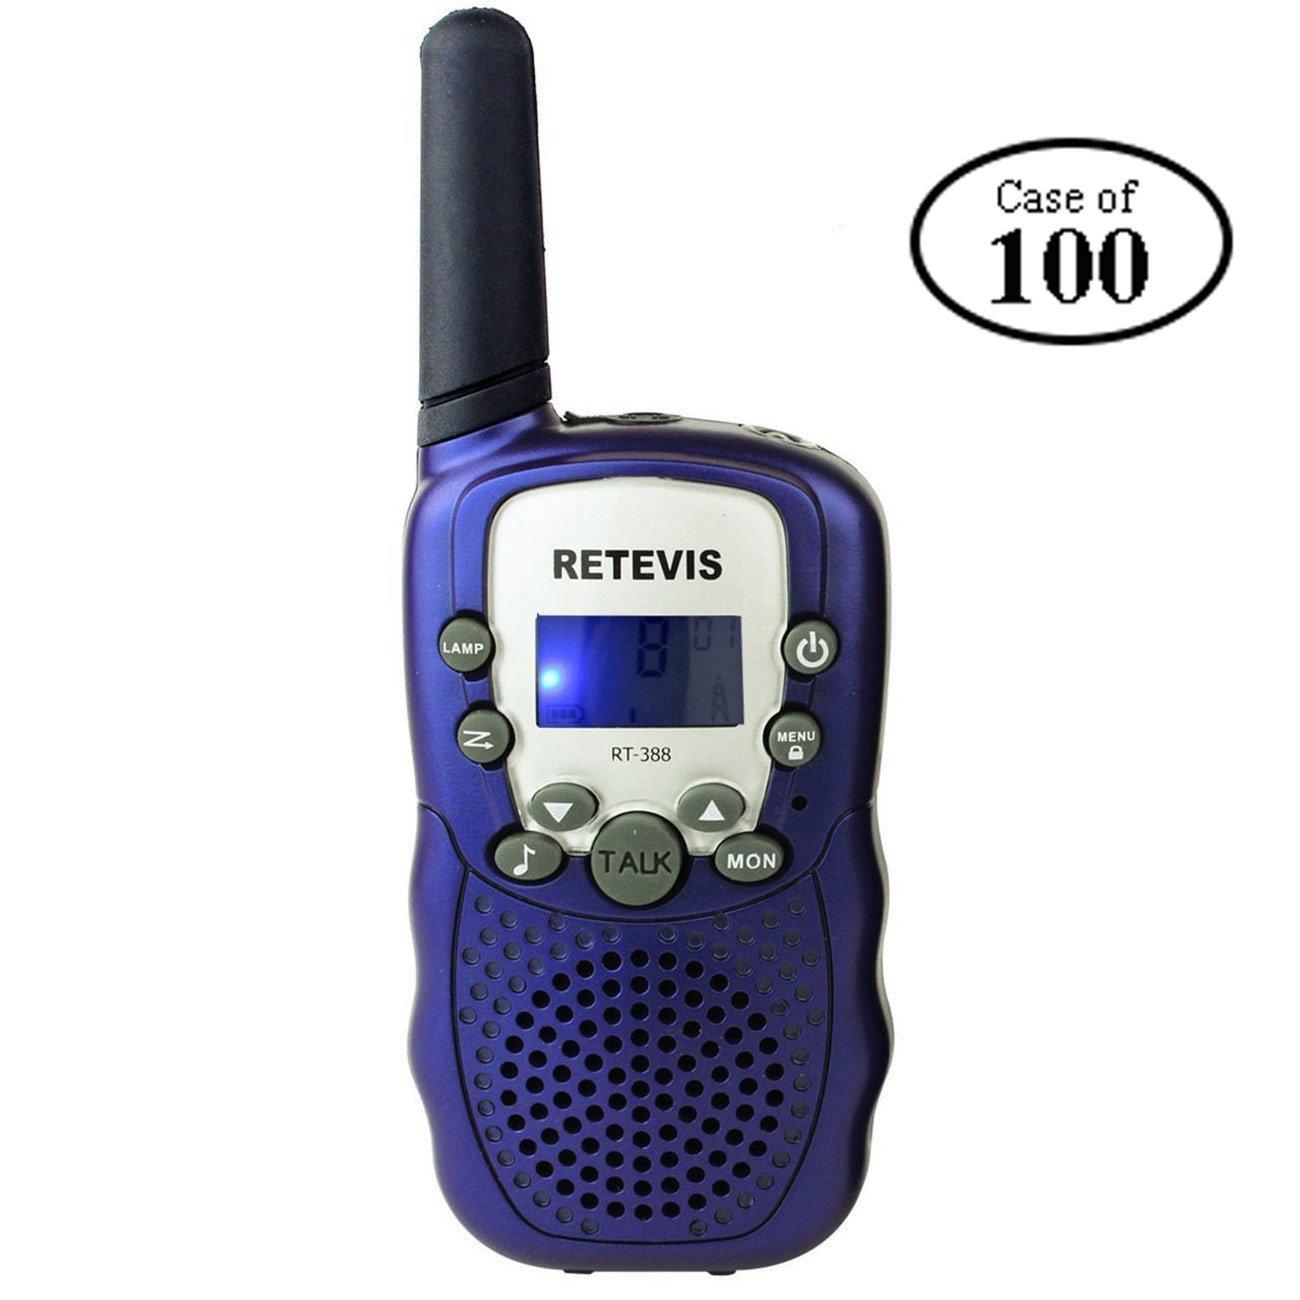 Case of 100,Retevis RT-388 Kids Walkie Talkies Boys 0.5W License Free 22CH FRS Toy Walkie Talkies